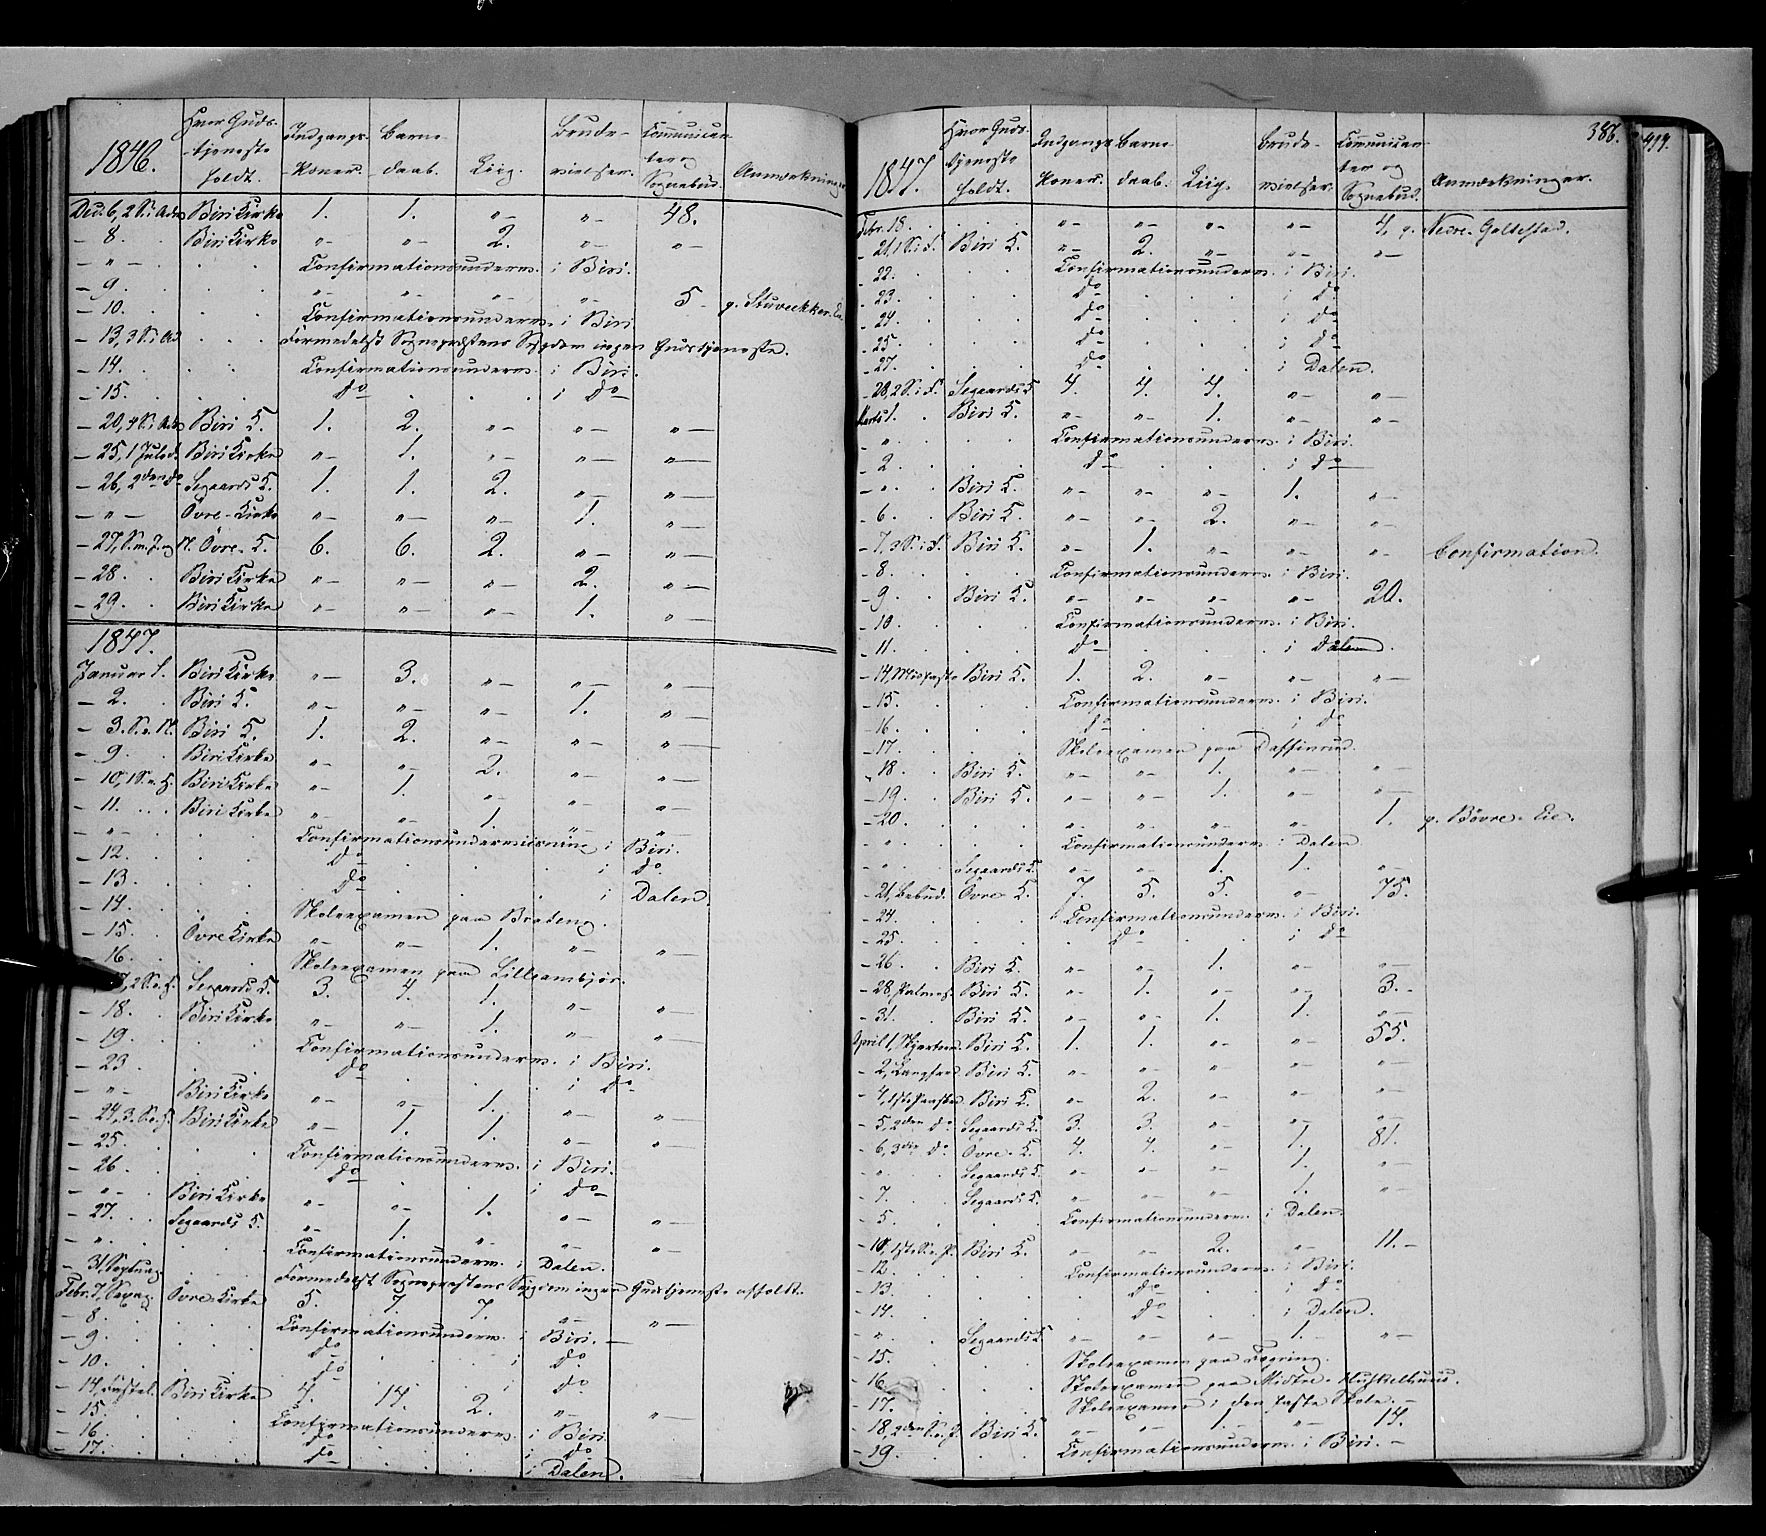 SAH, Biri prestekontor, Ministerialbok nr. 5, 1843-1854, s. 386